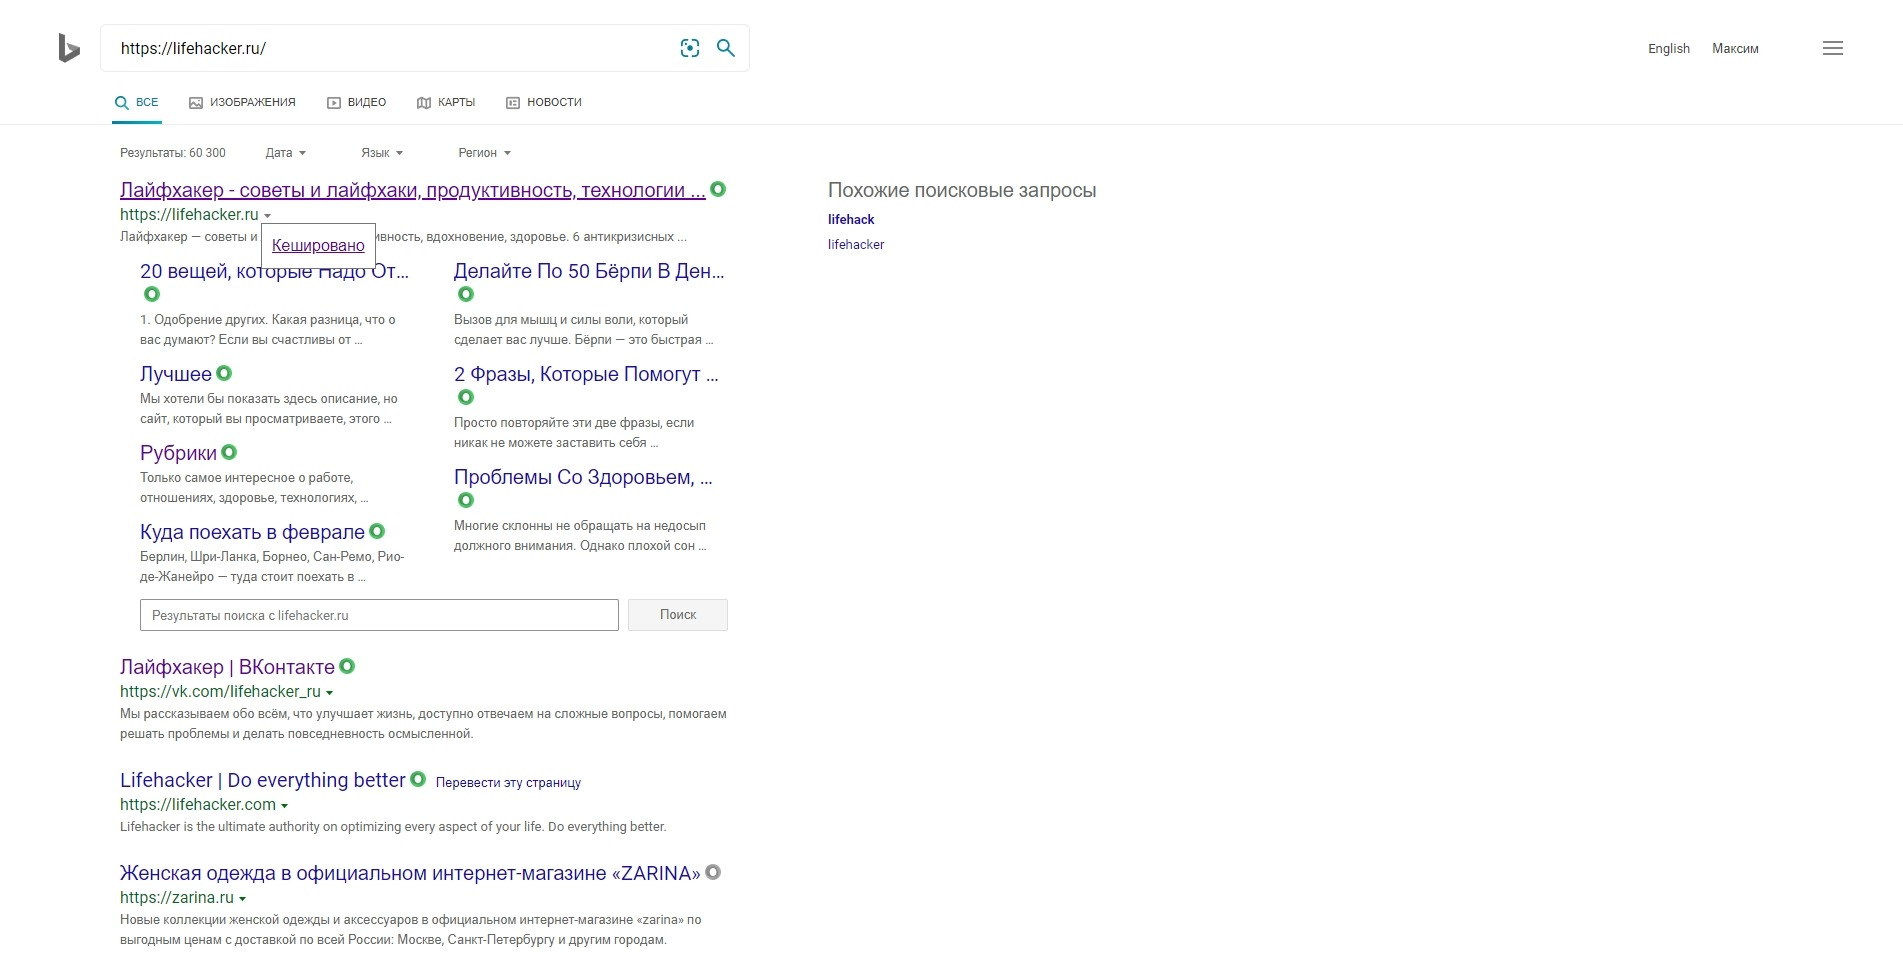 Удалённая страница: кеш Bing